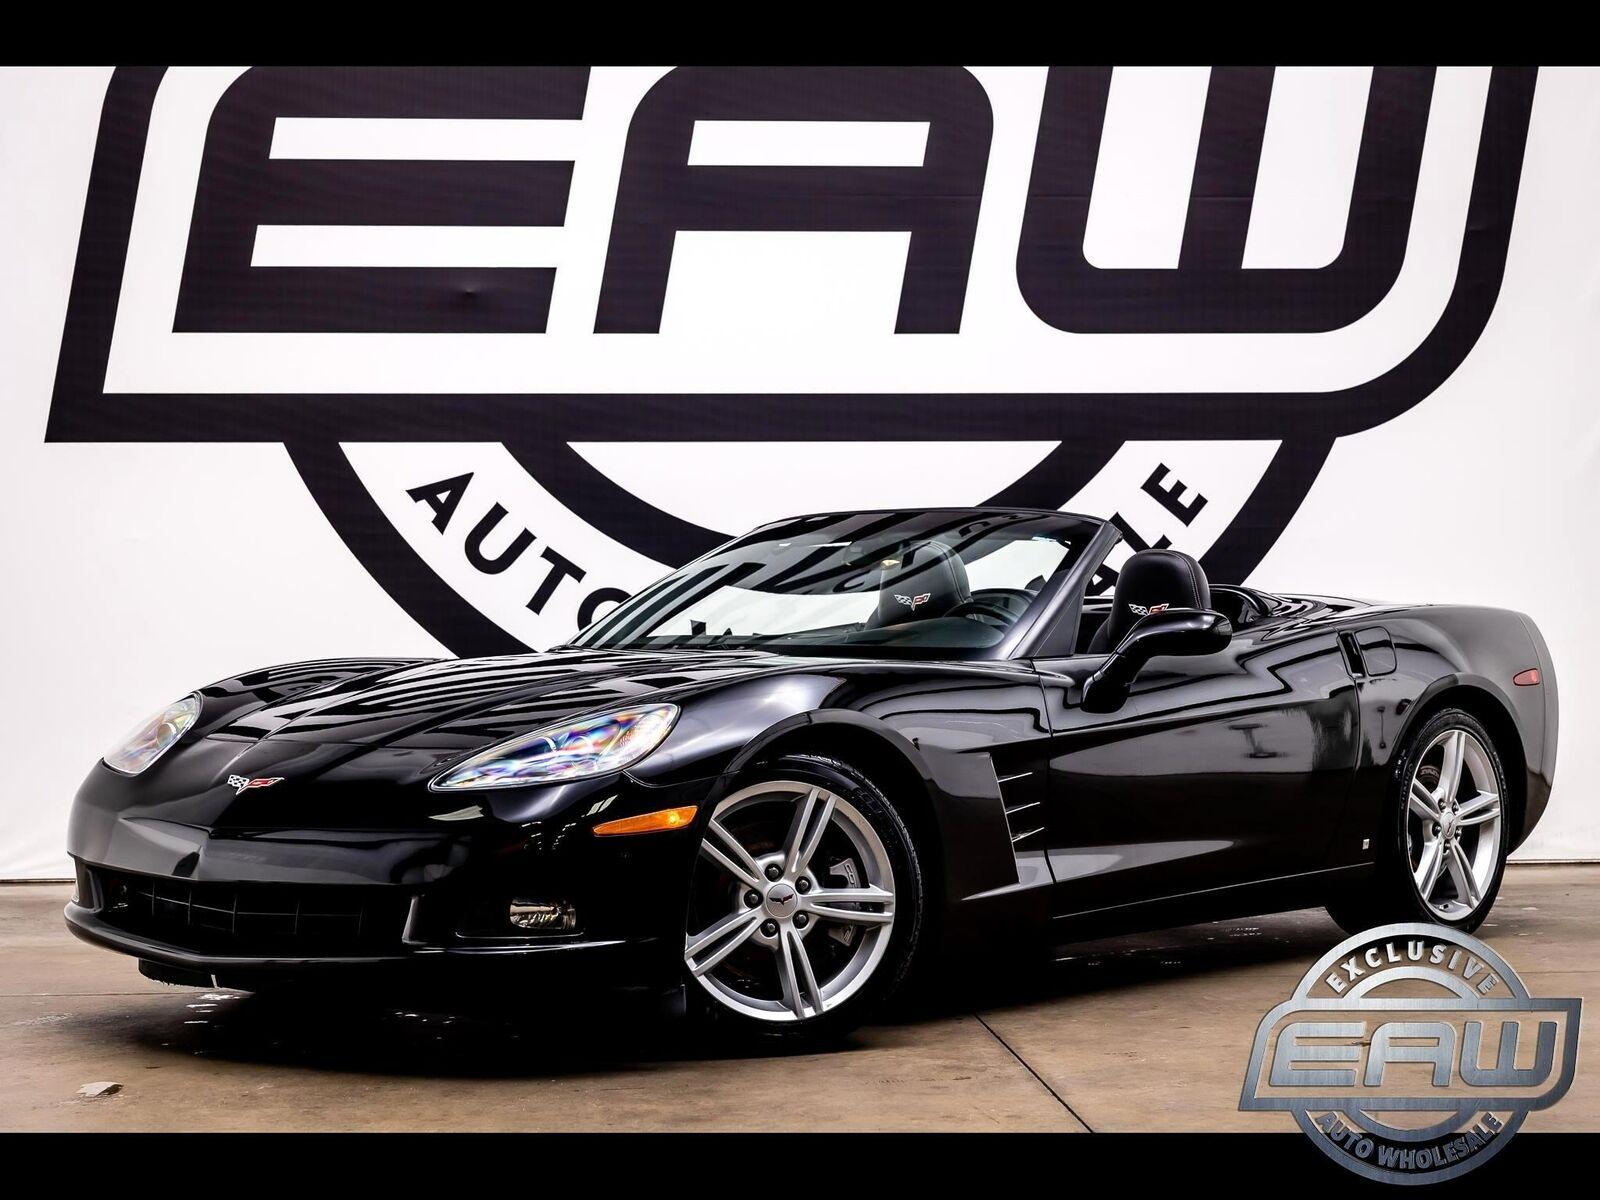 2008 Black Chevrolet Corvette Convertible  | C6 Corvette Photo 1